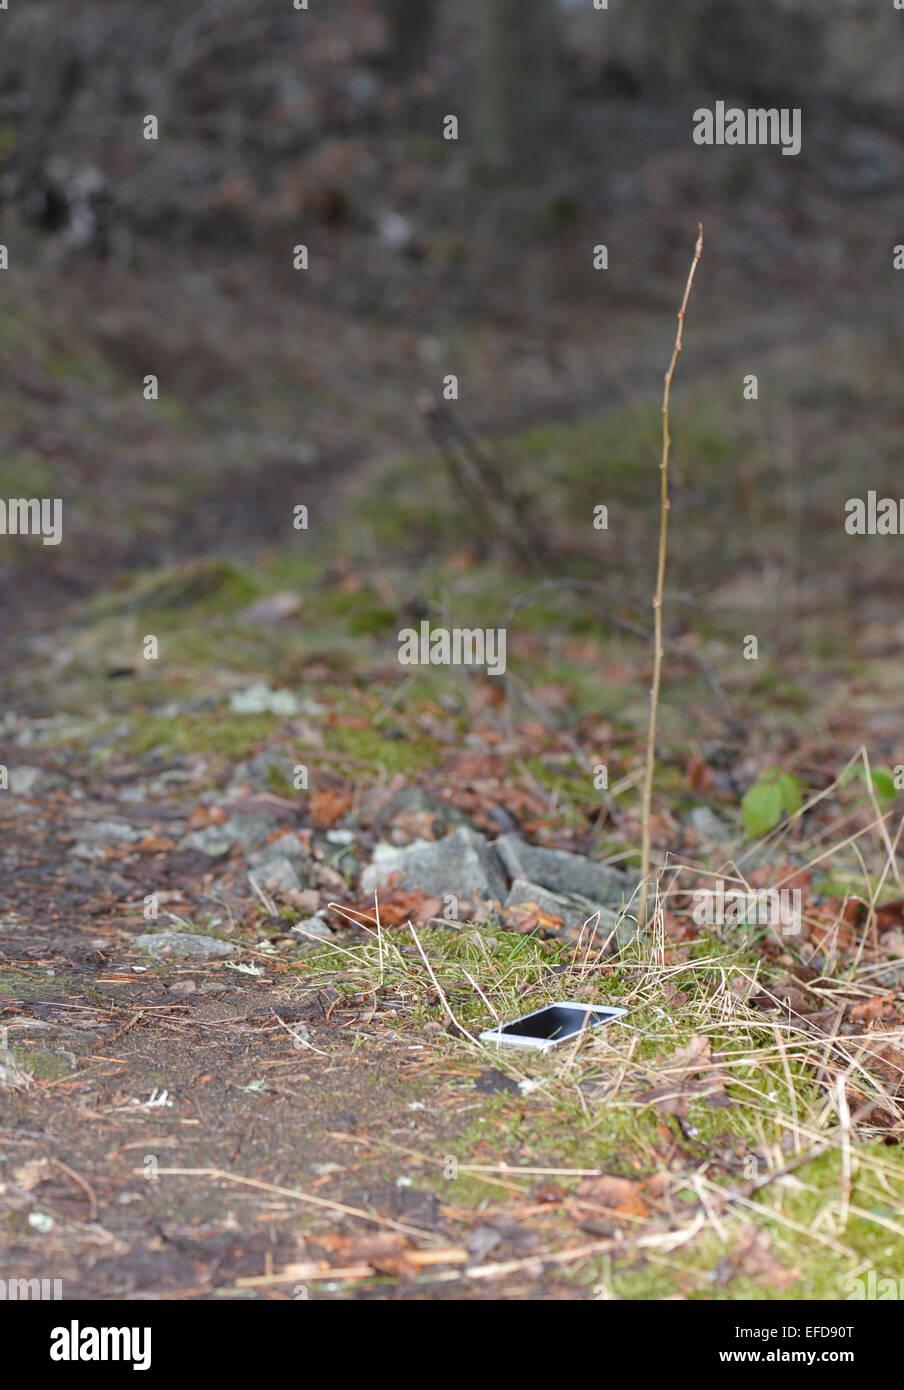 Handy verloren am Wanderweg im Wald Stockbild